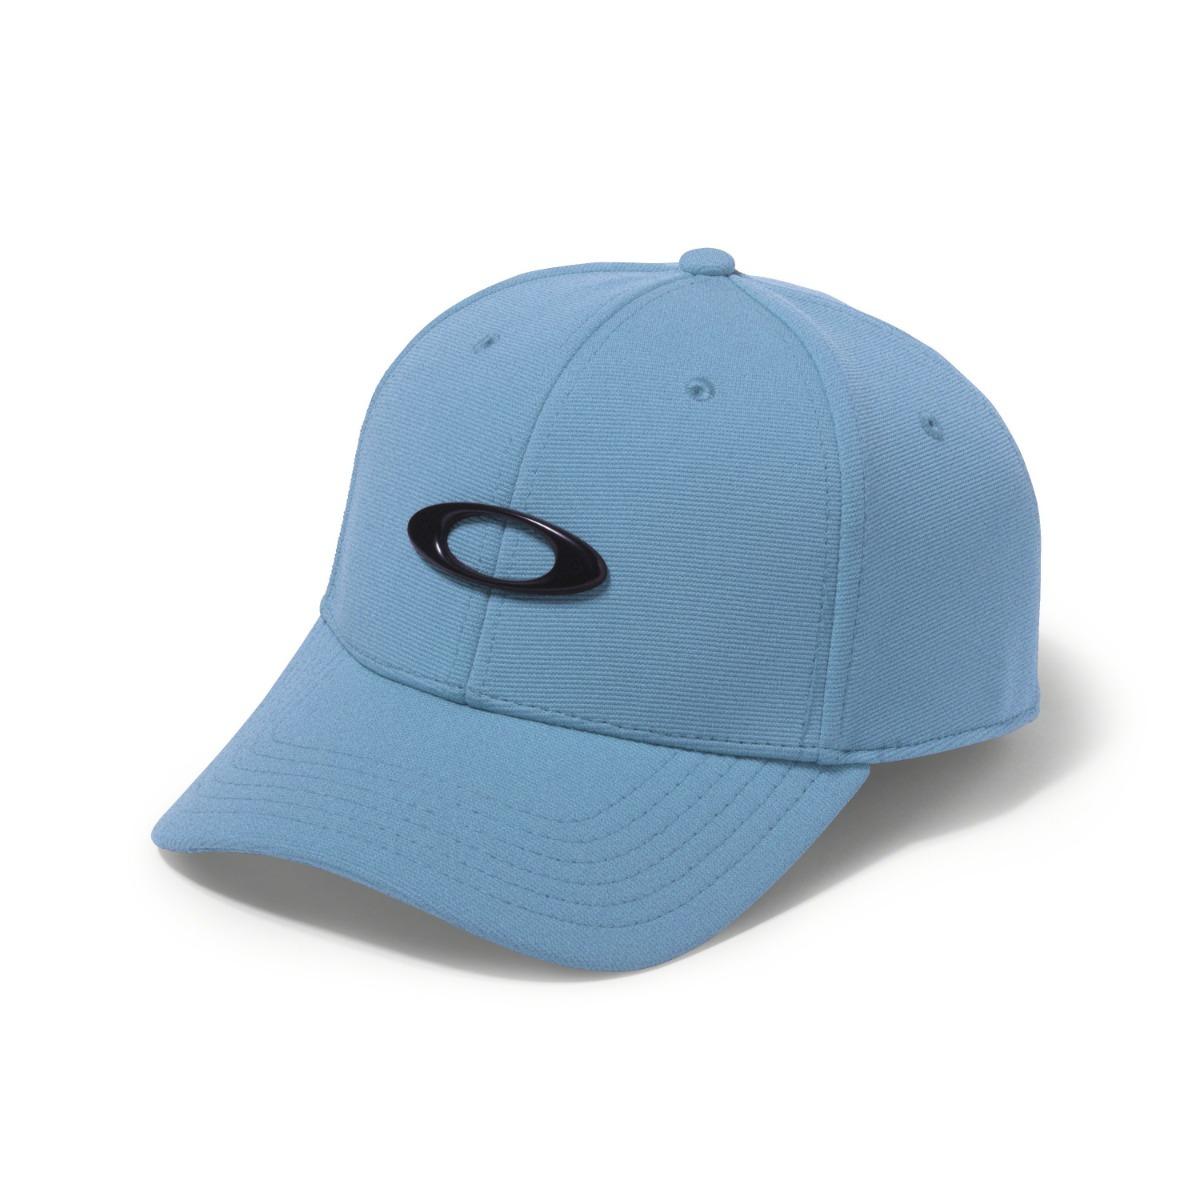 eecc3cfab5703 Boné Masculino Oakley Tincan Cap Ethereal Blue (s m) - R  209